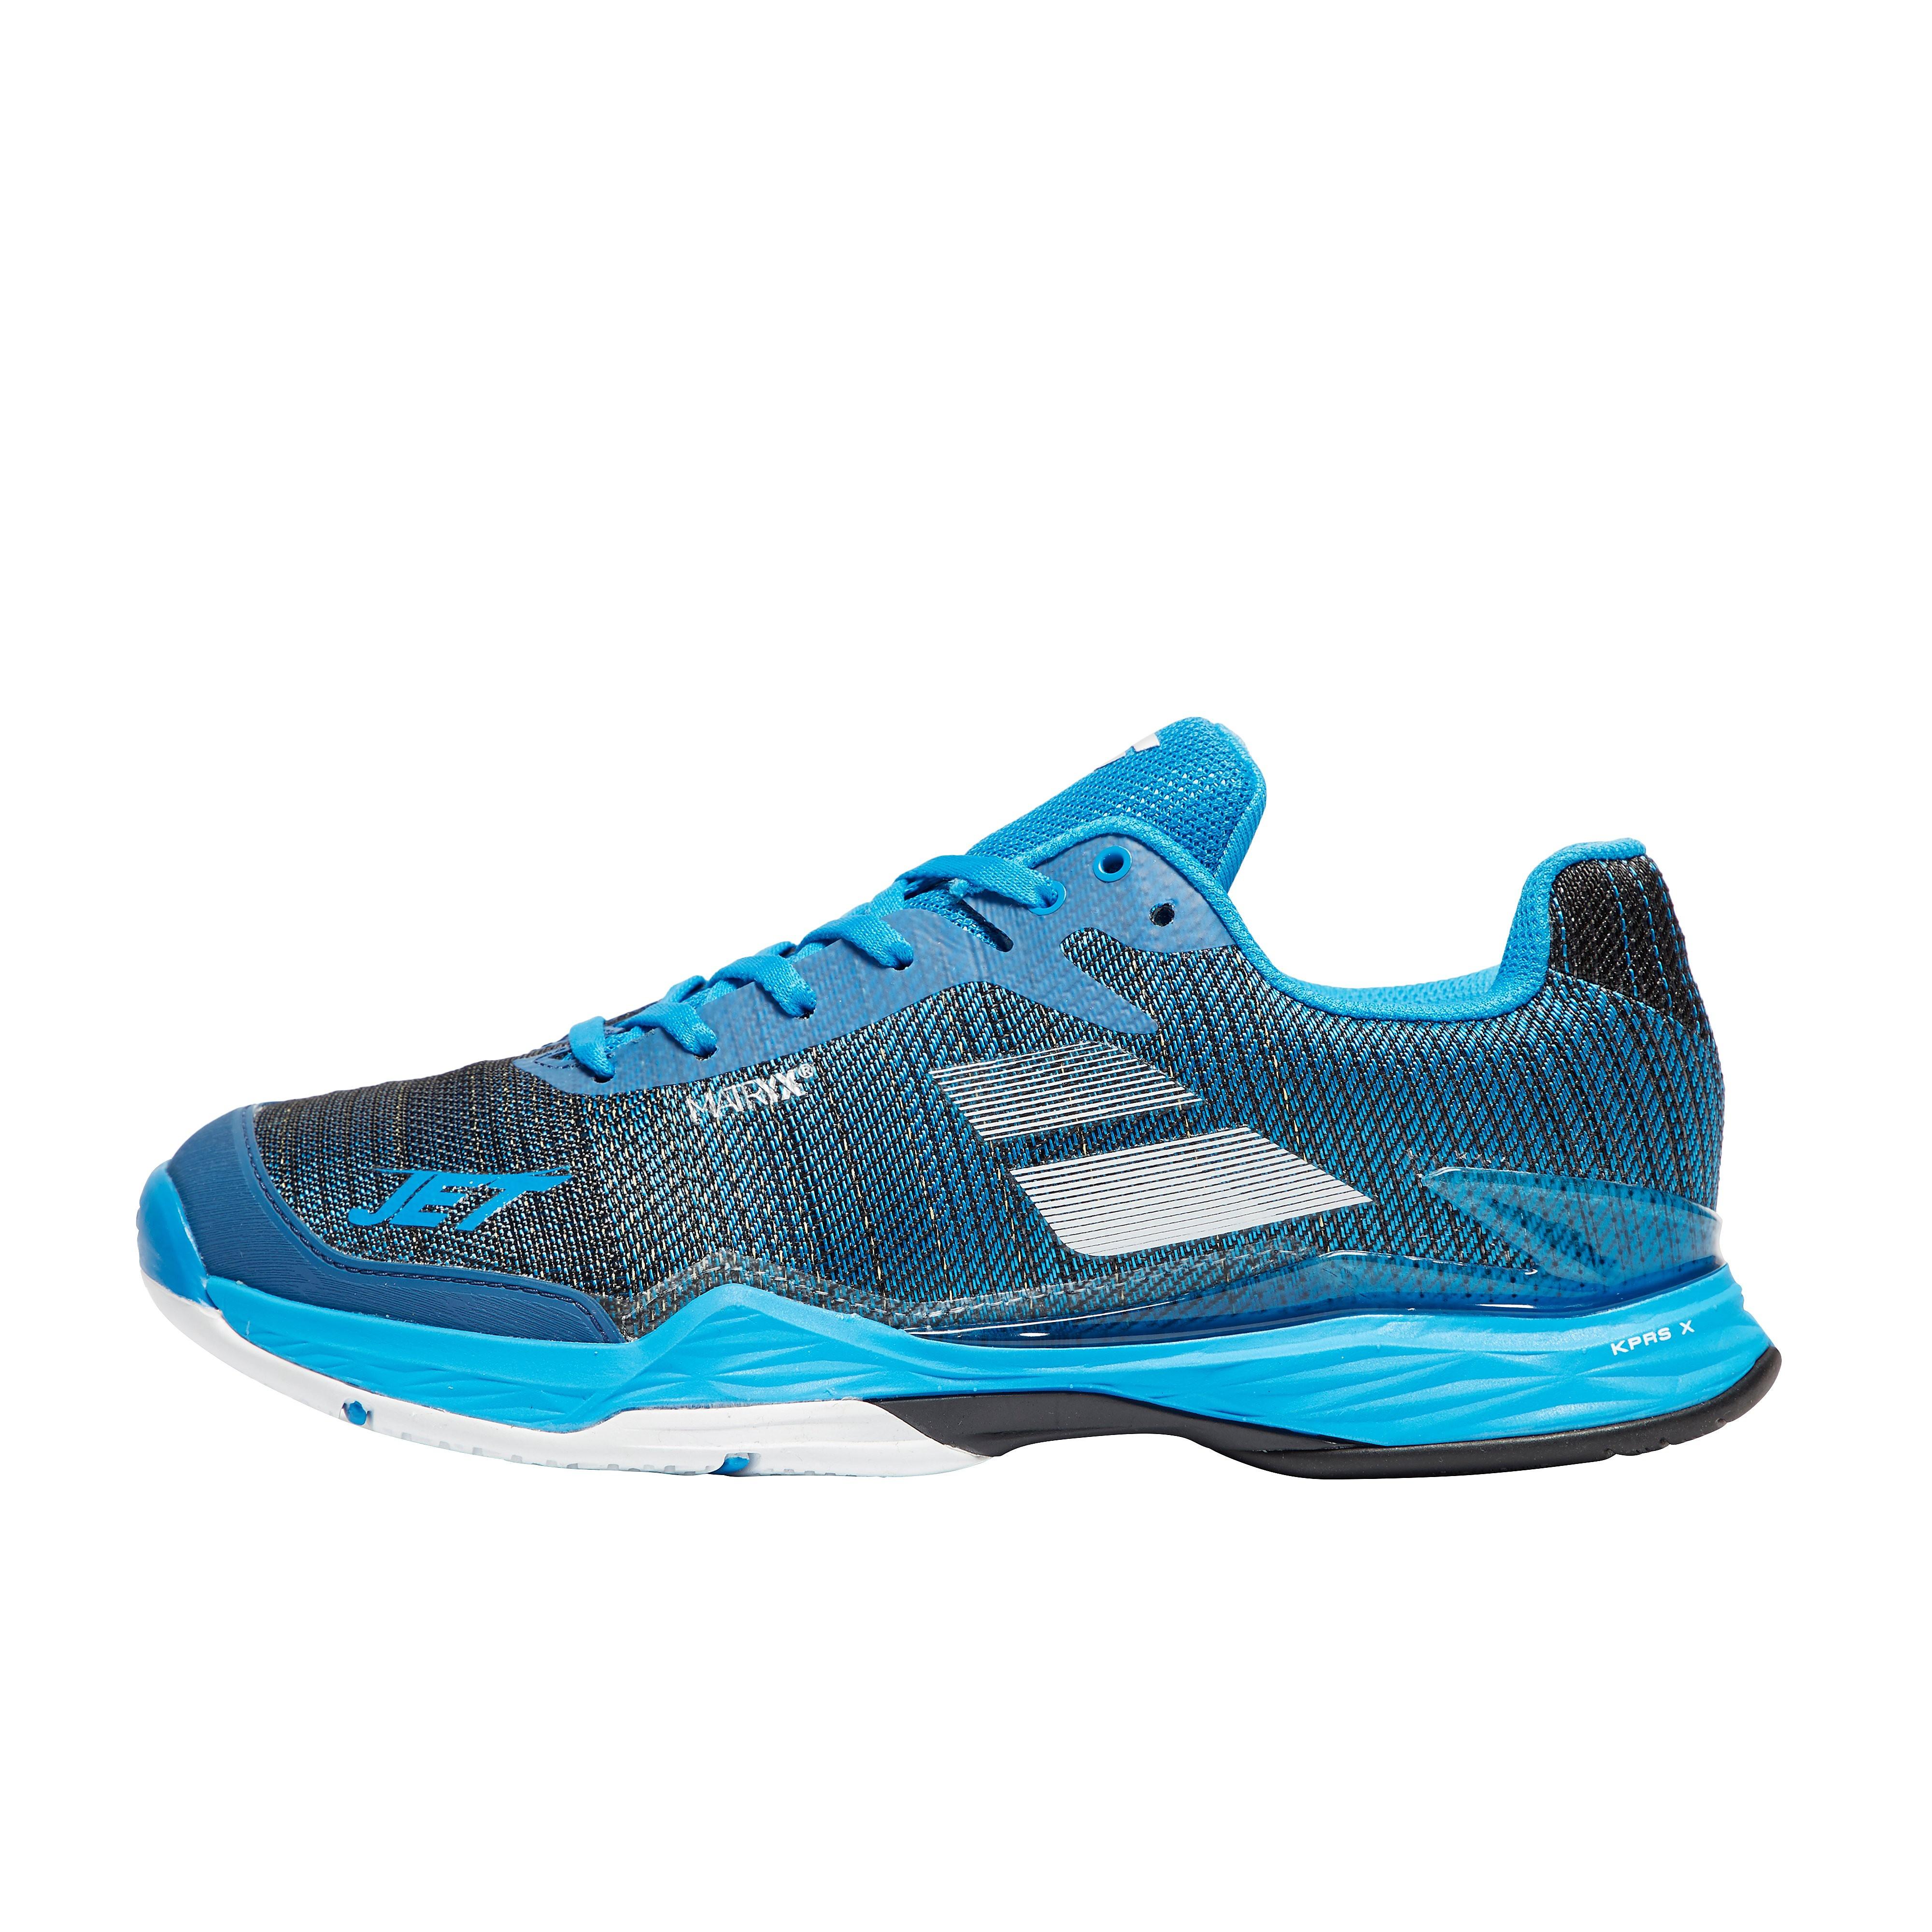 Babolat Jet Mach II Men's All Court Tennis Shoes